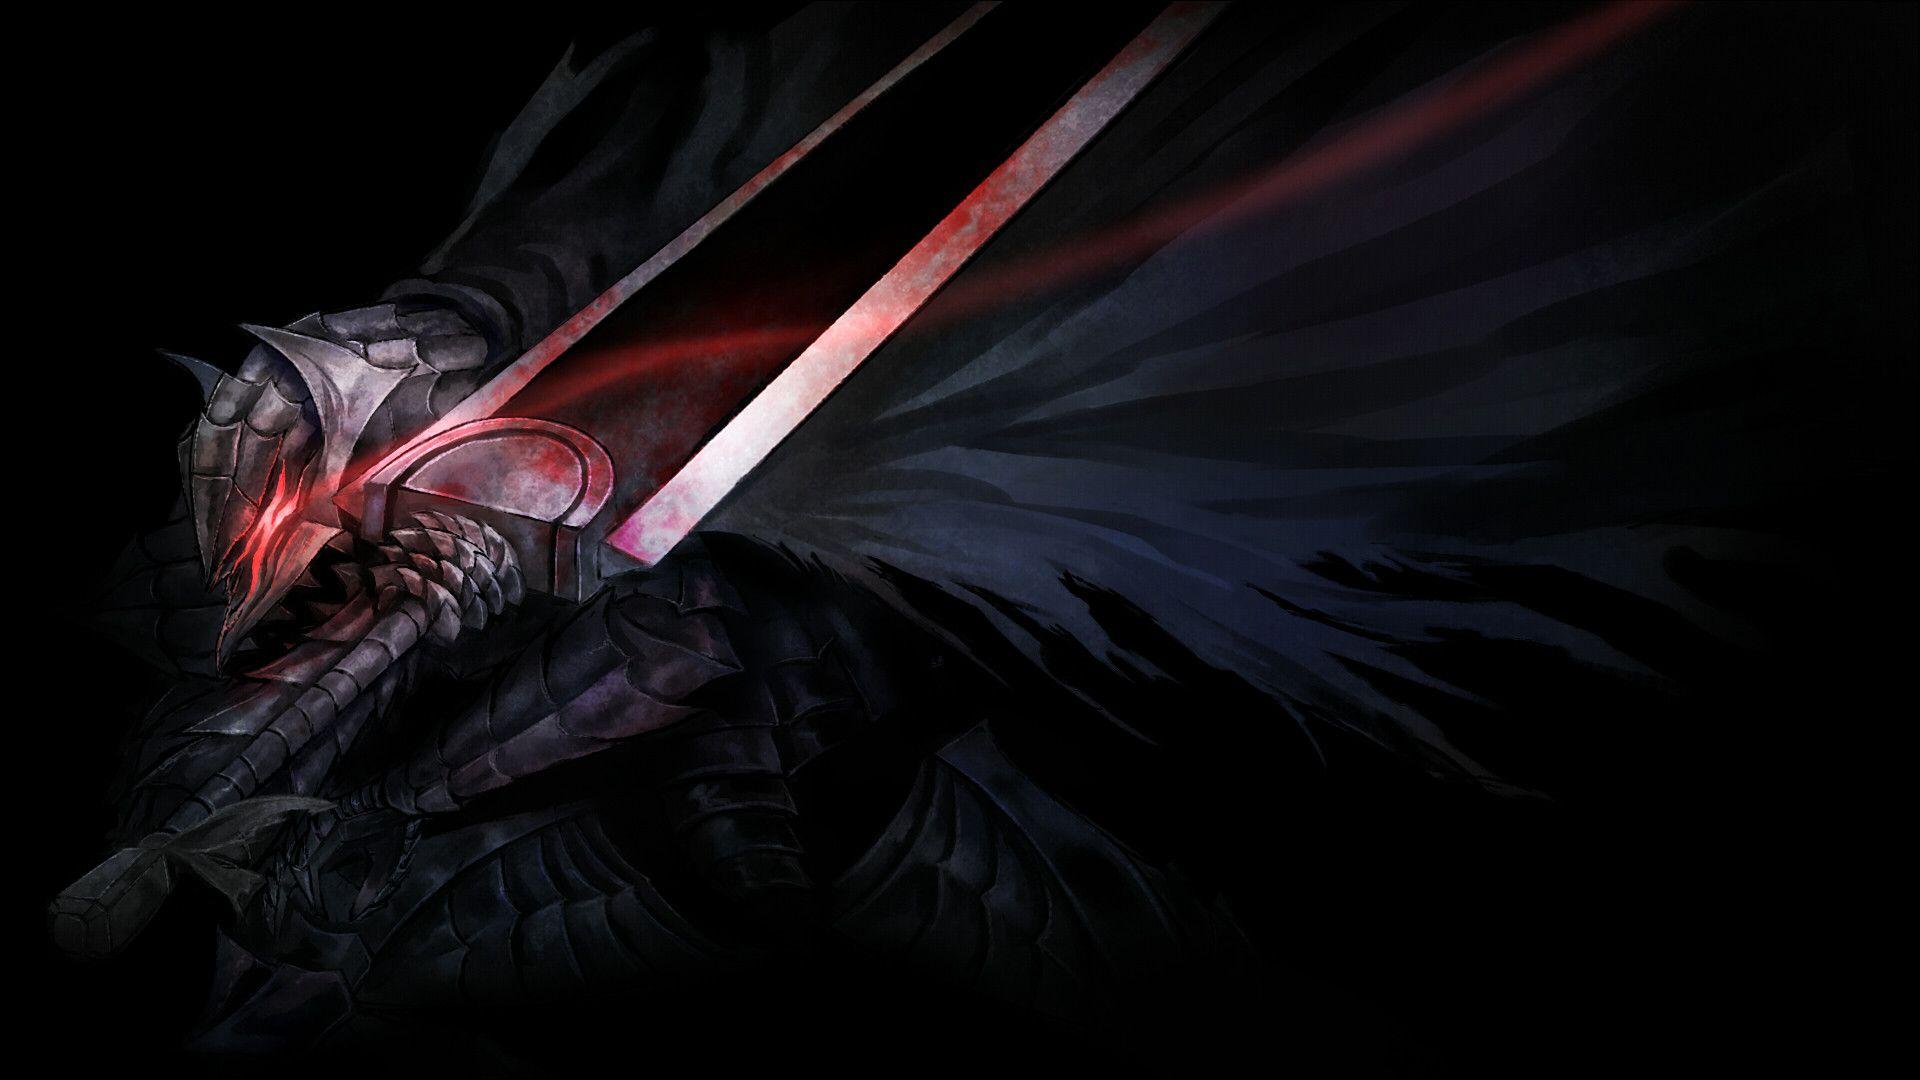 Res 1920x1080 Anime Berserk Guts Berserk Wallpaper Berserk Slayer Anime Anime